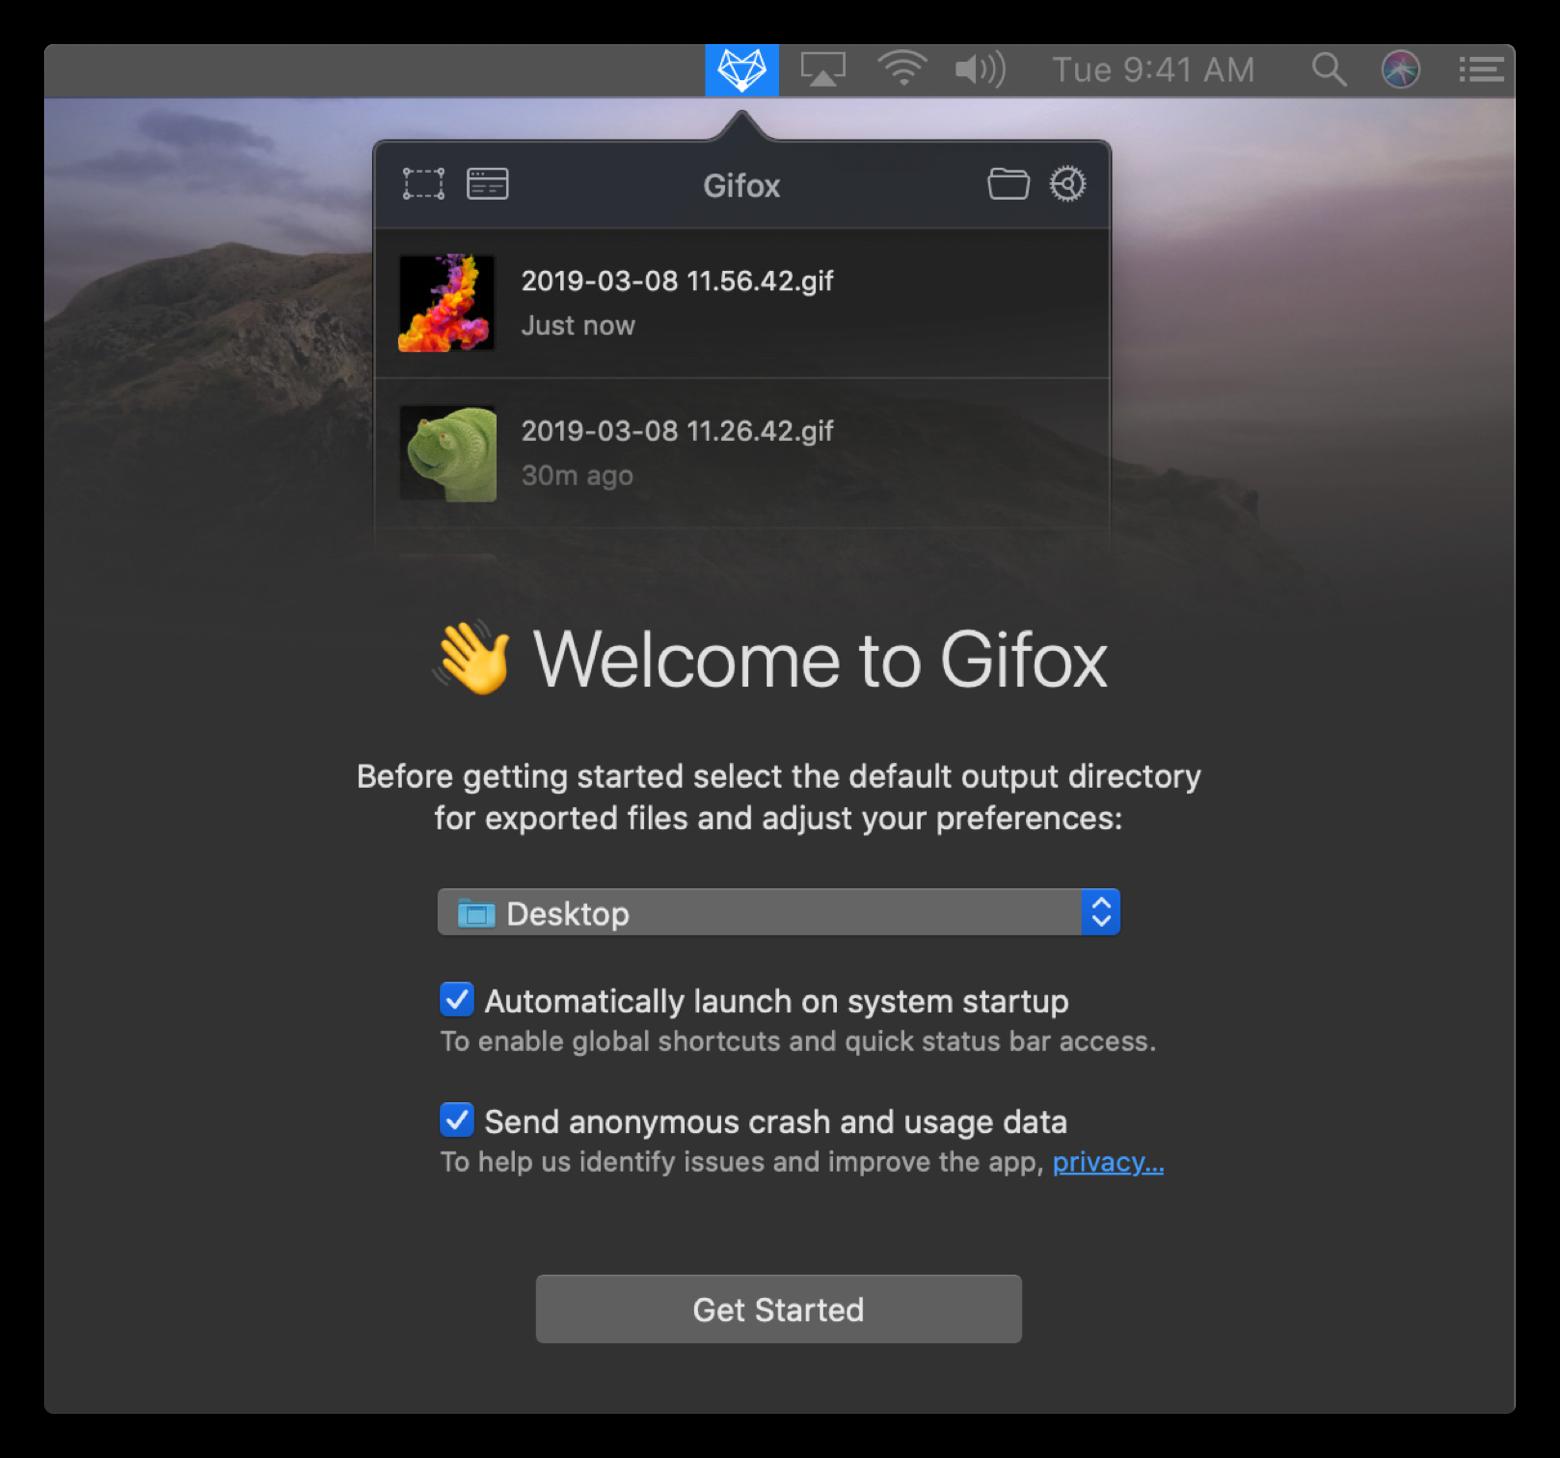 Gifox Setapp start screen